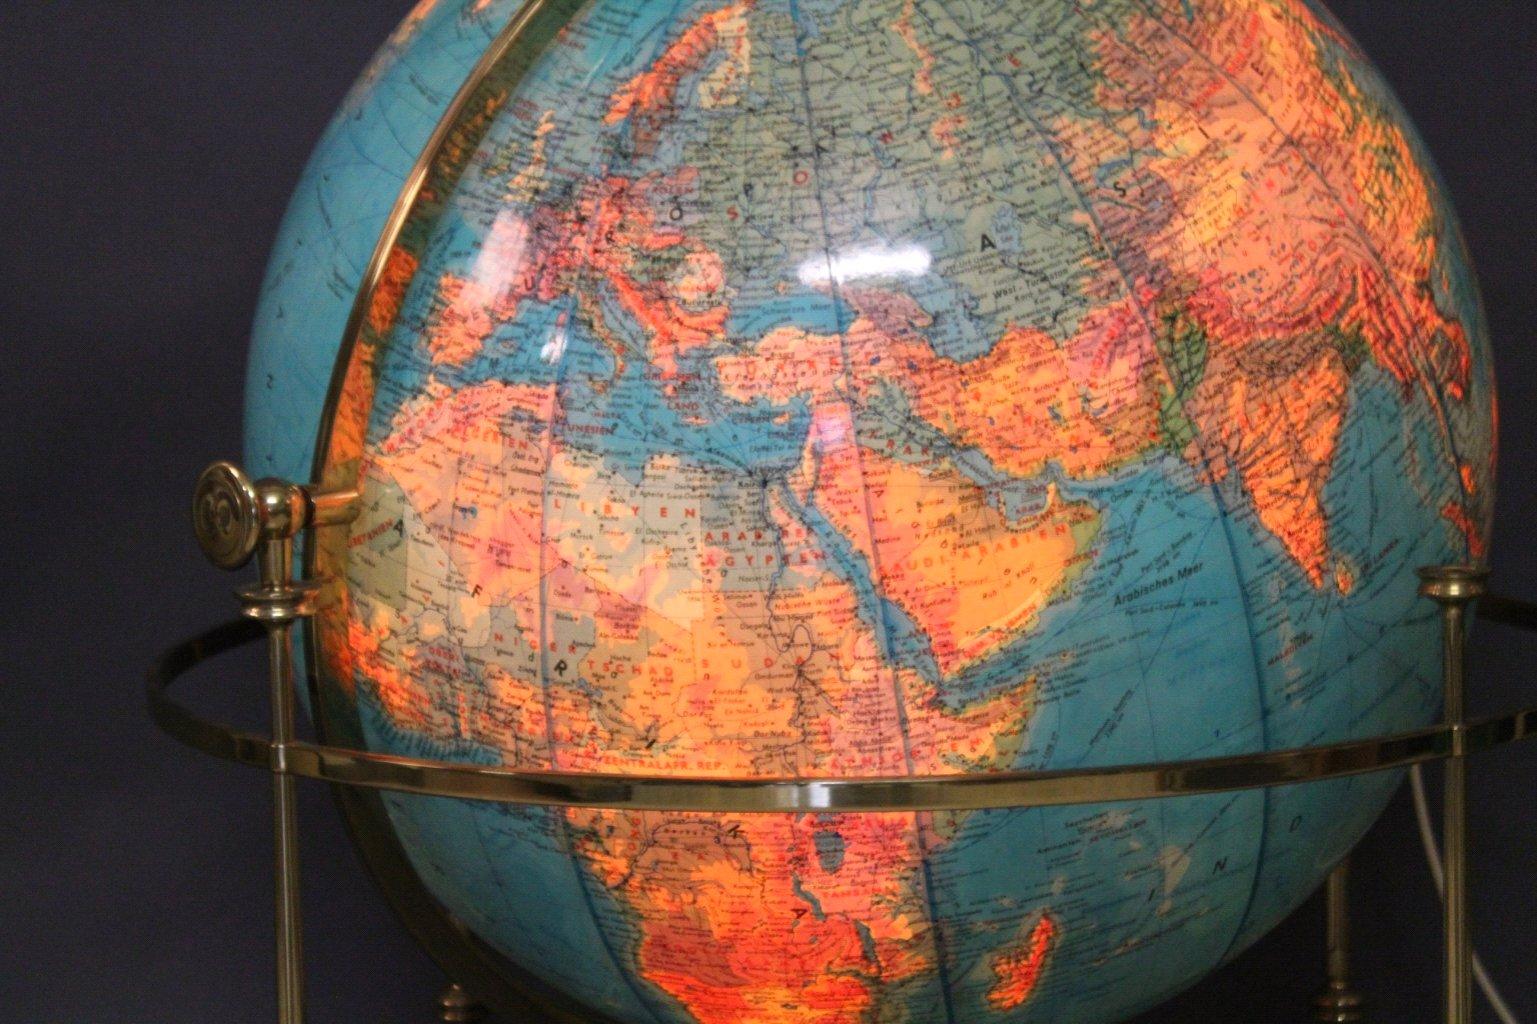 Vintage Globus aus Acryl von JRO, 1976-3